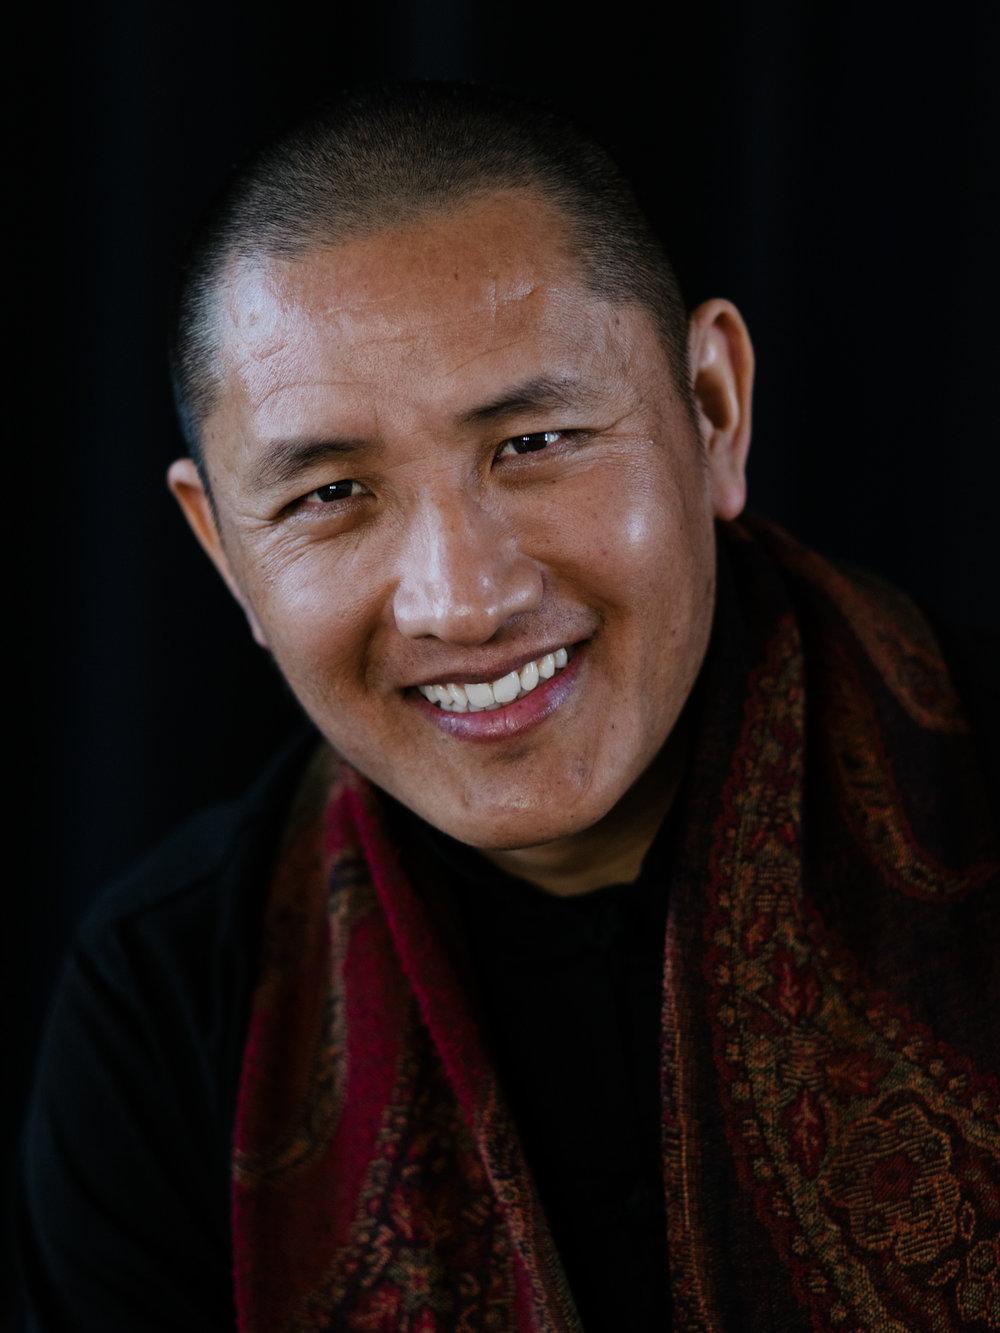 IMGP2398_Tulku-Lobsang-Rinpoche_Farbe©Sven-Cichowicz.jpg